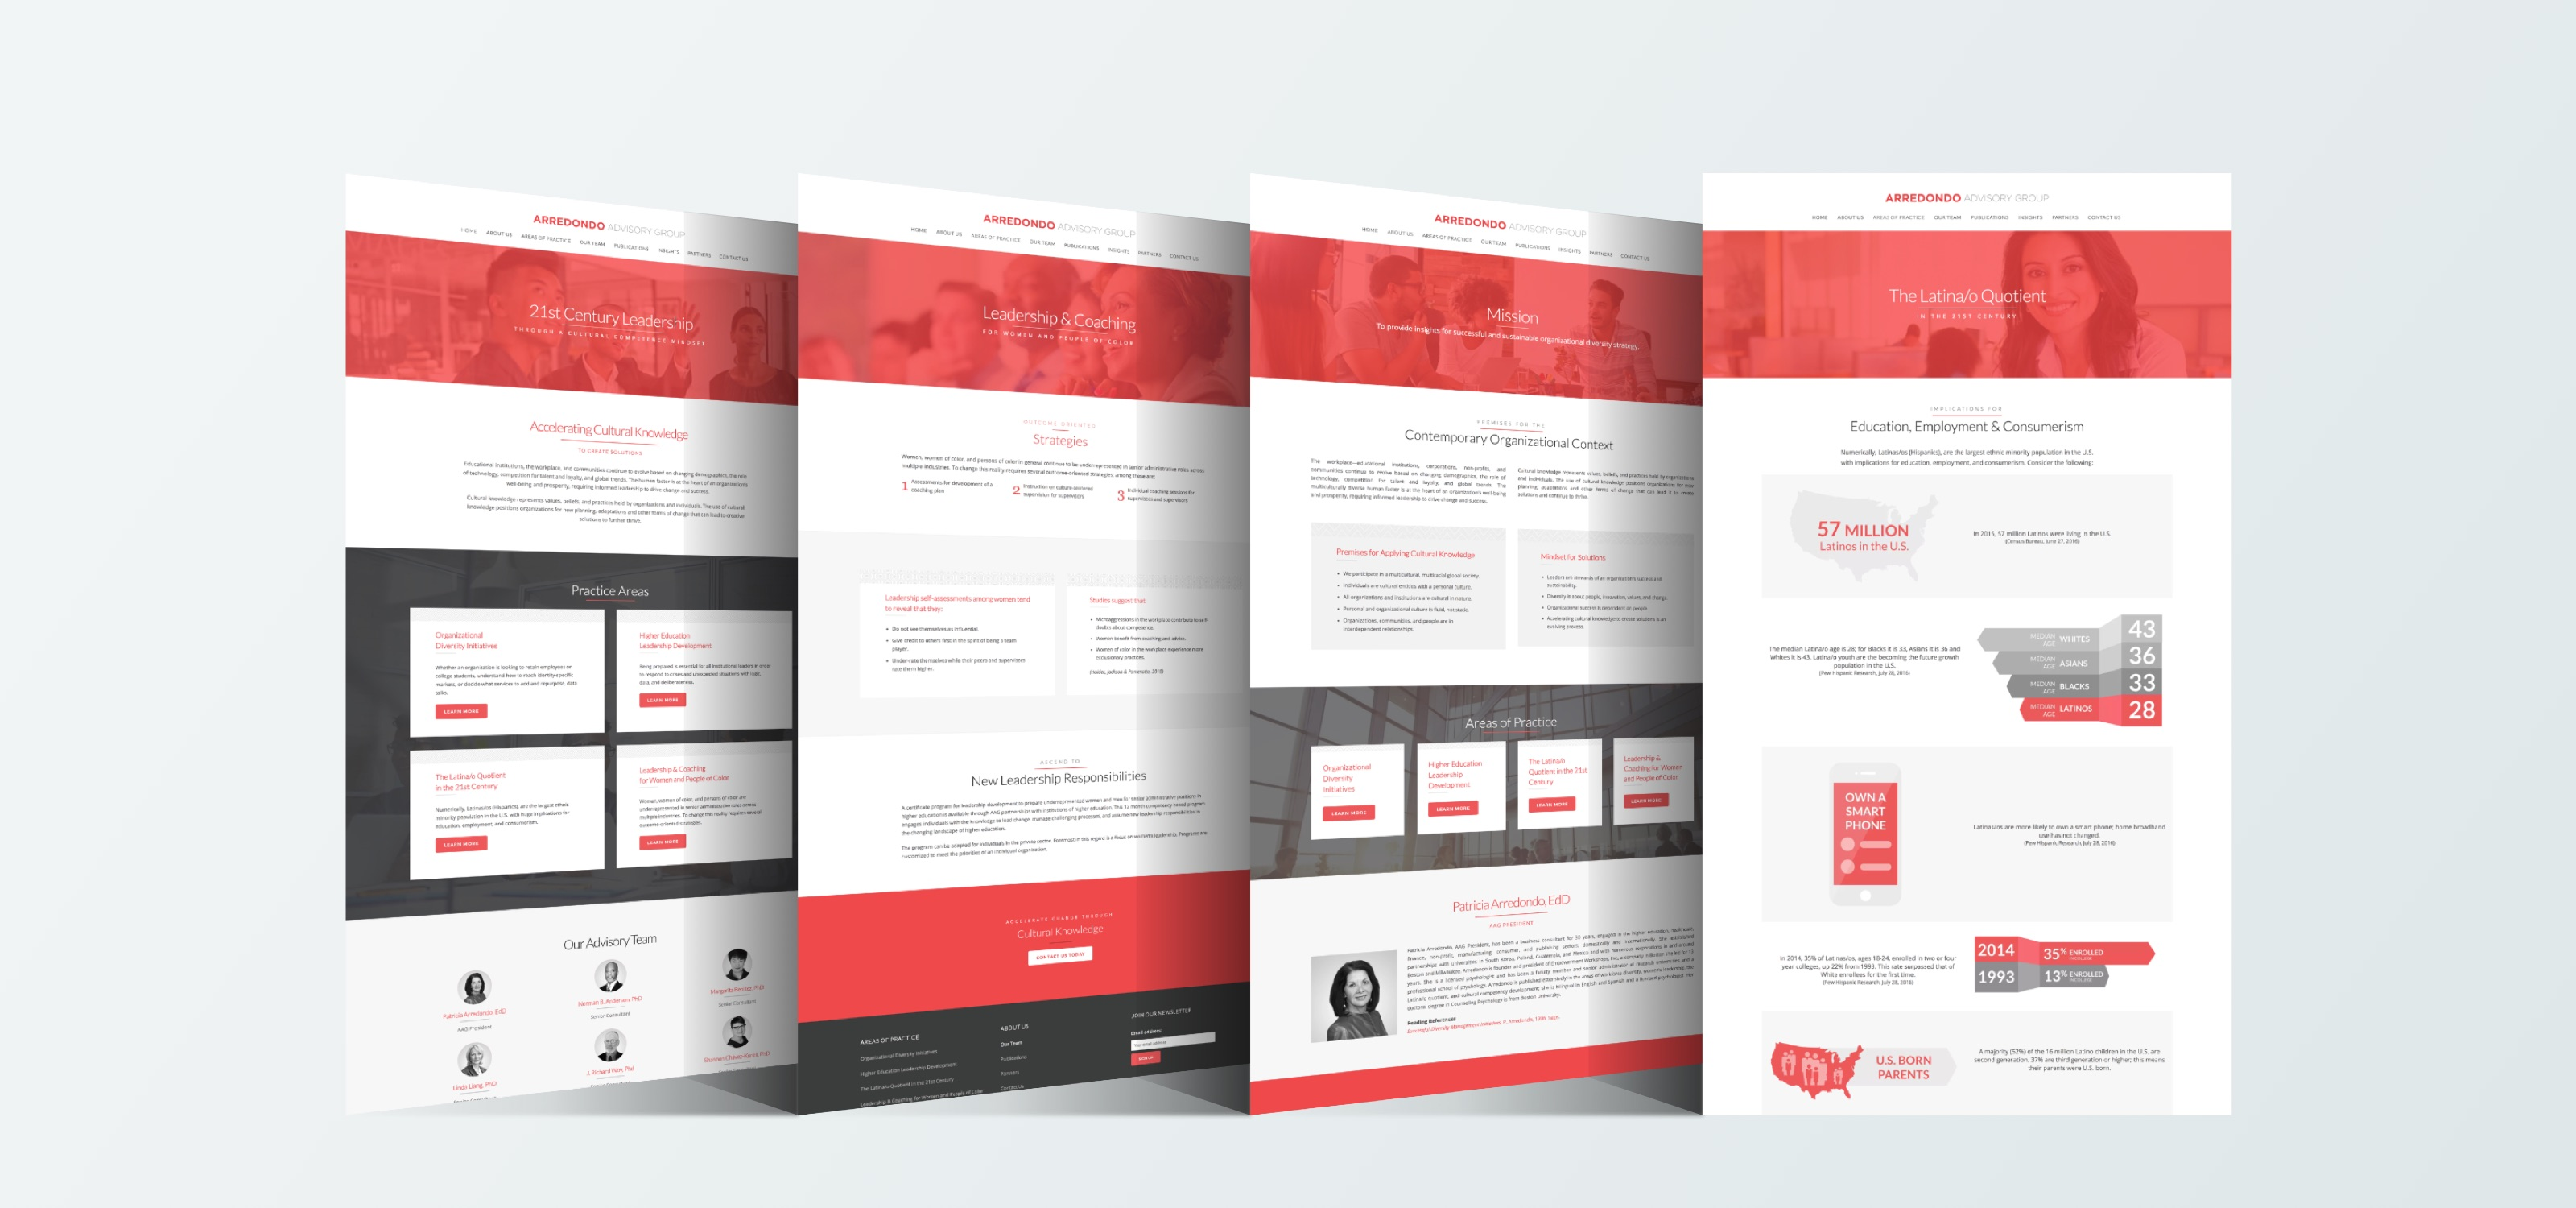 AAG Responsive Web Design